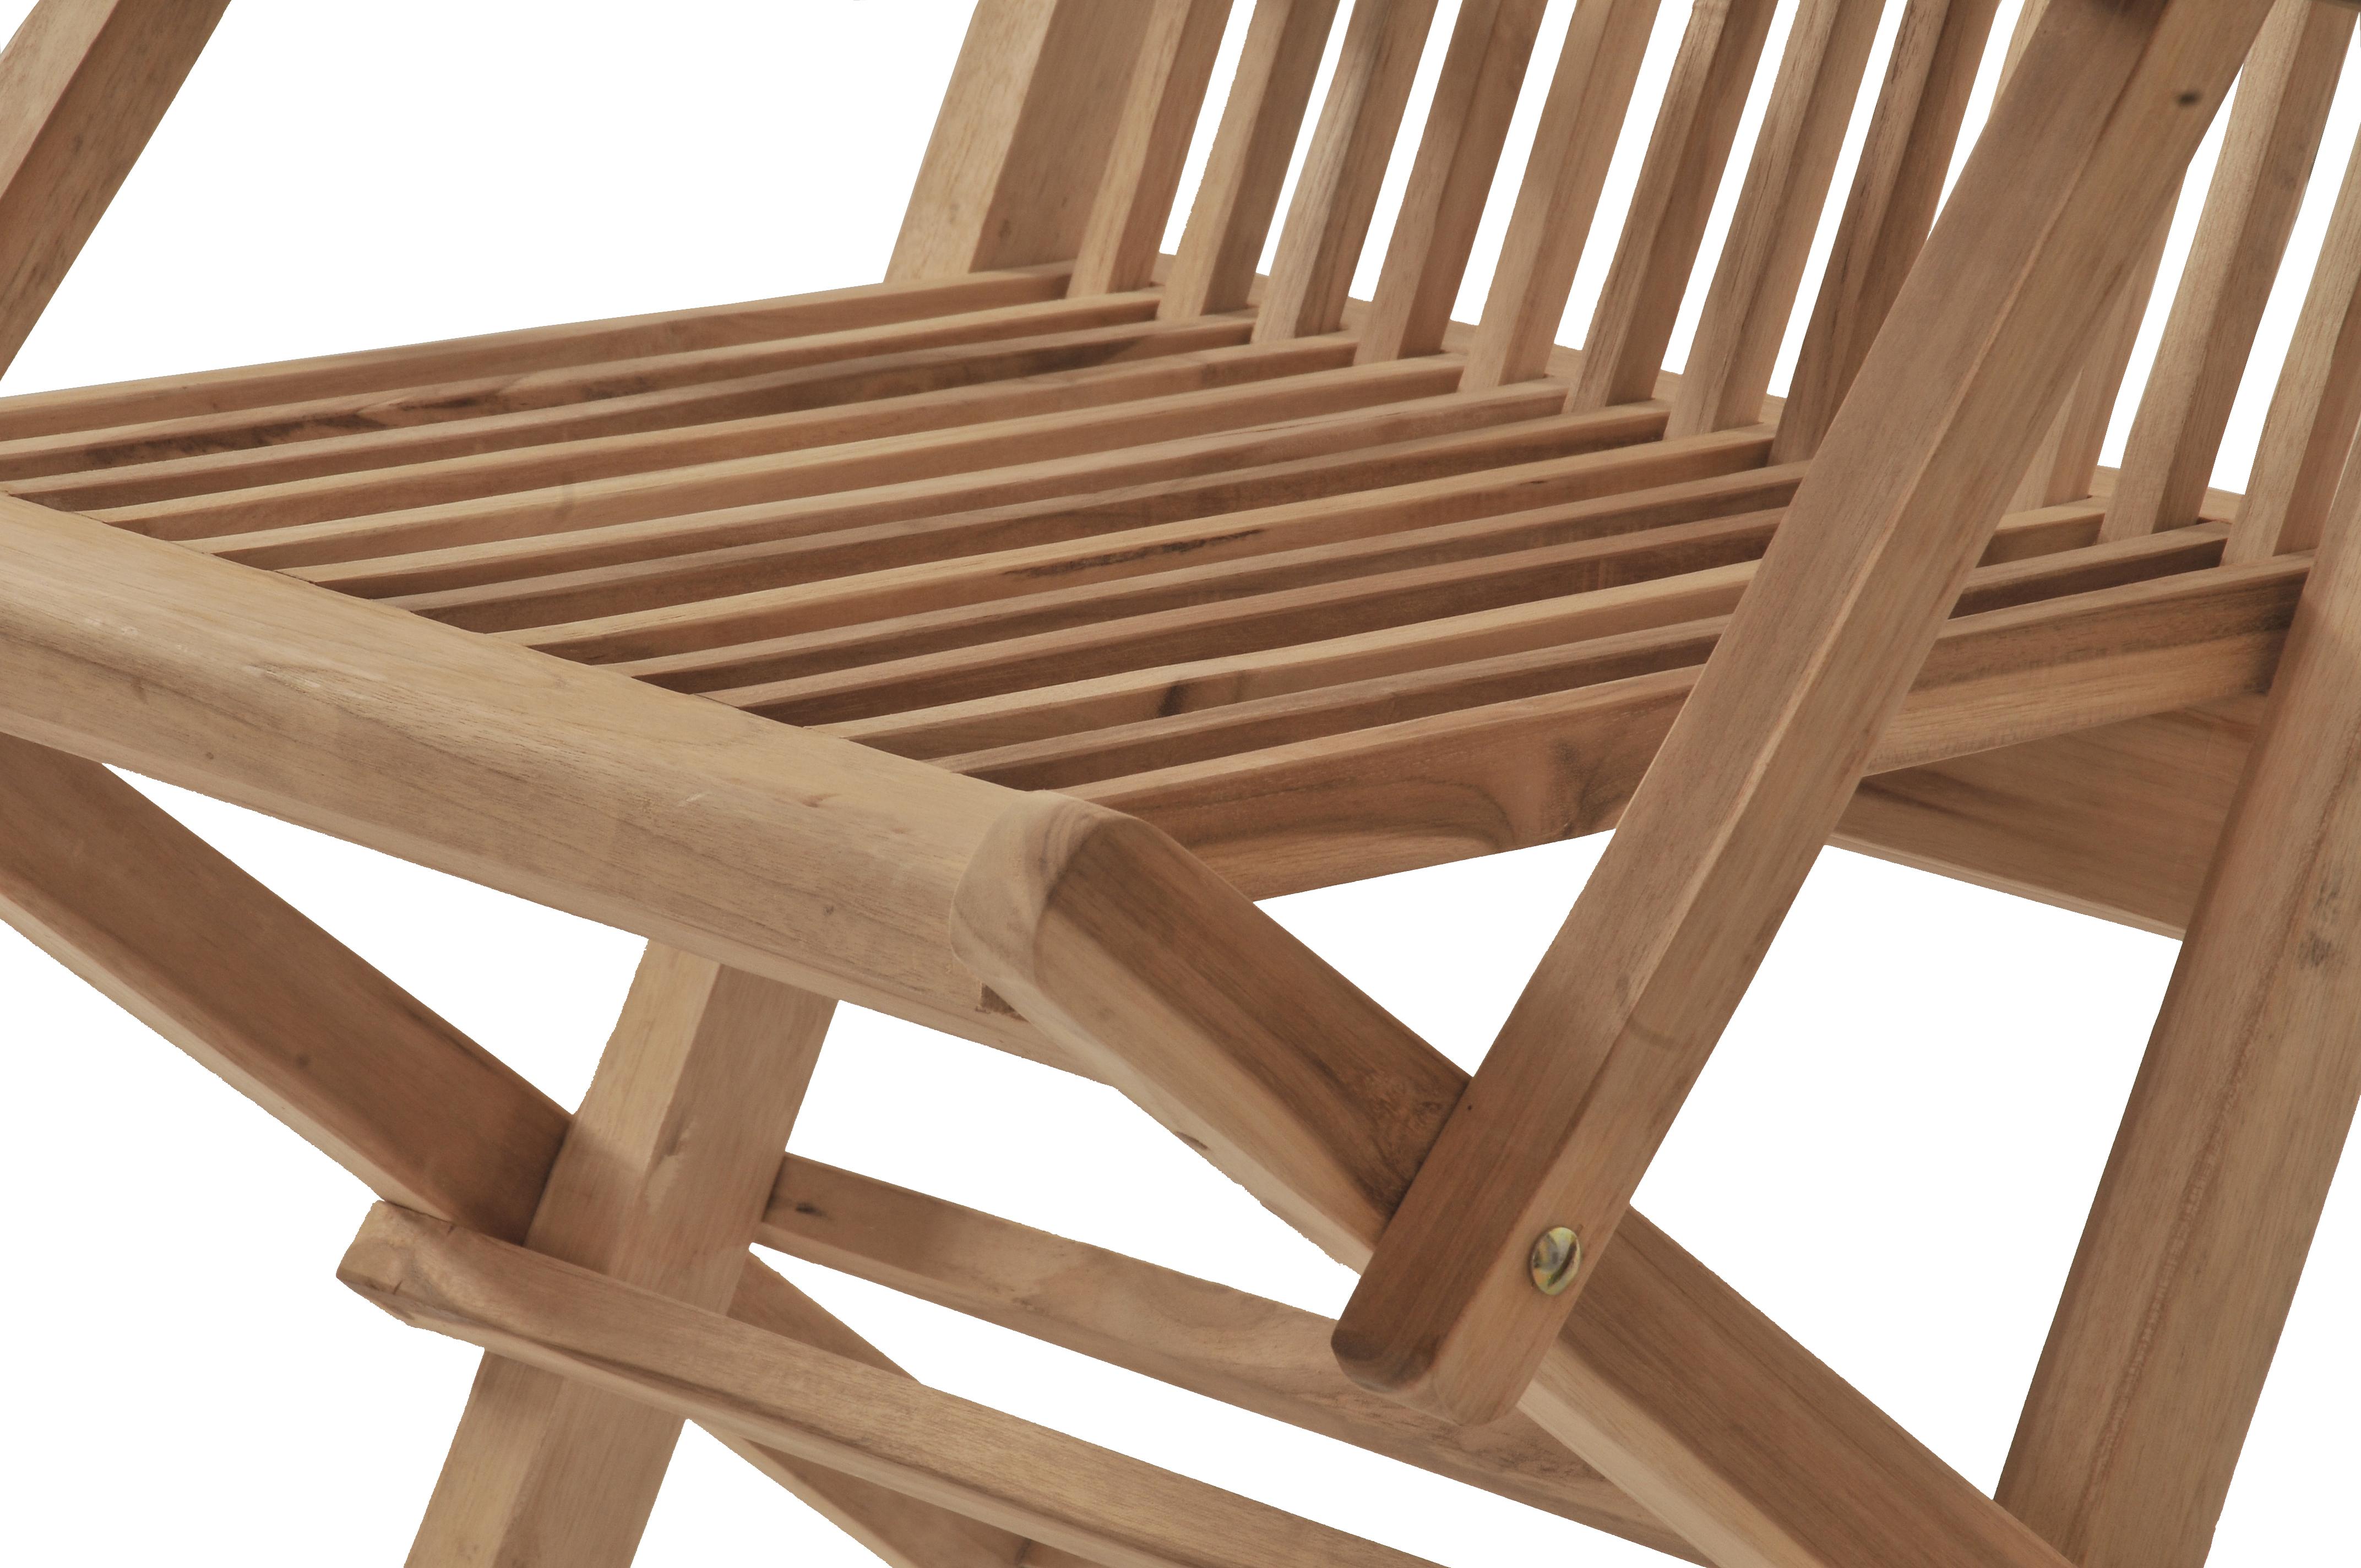 sam teak klappstuhl mit armlehne mallorca auf lager. Black Bedroom Furniture Sets. Home Design Ideas